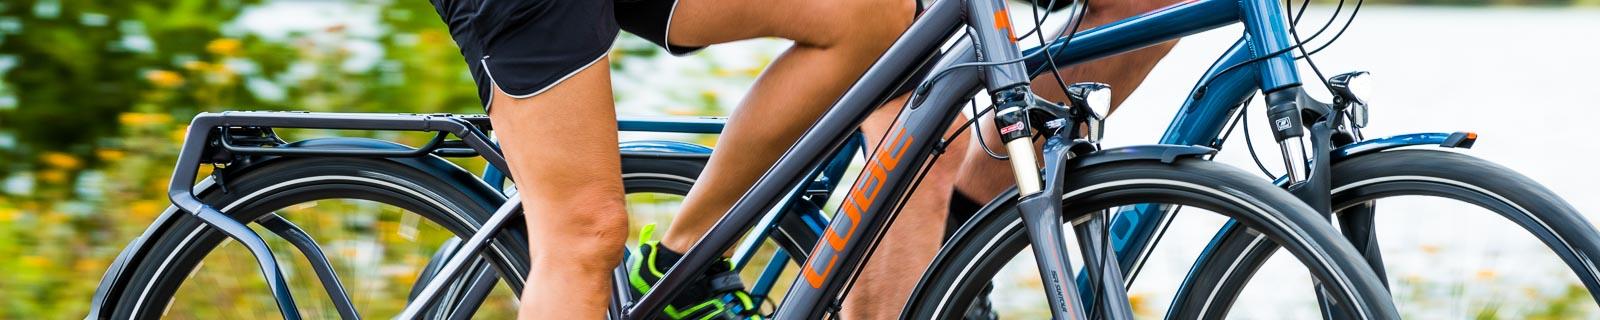 Biciclette da trekking per donne